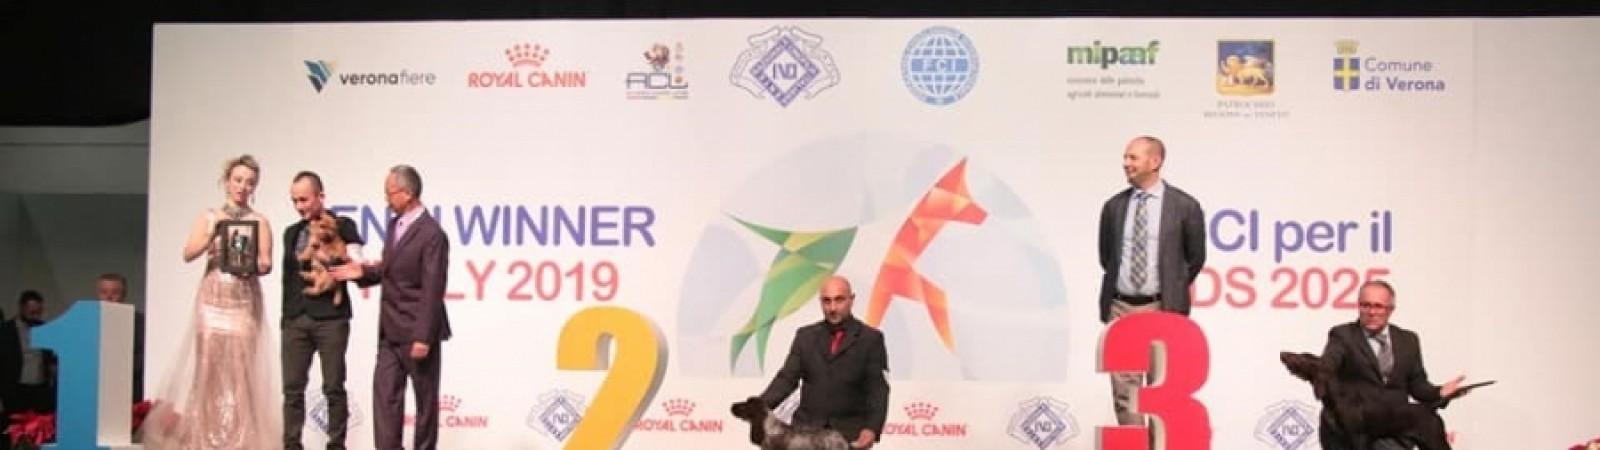 Soddisfazioni al ENCI winner 2019